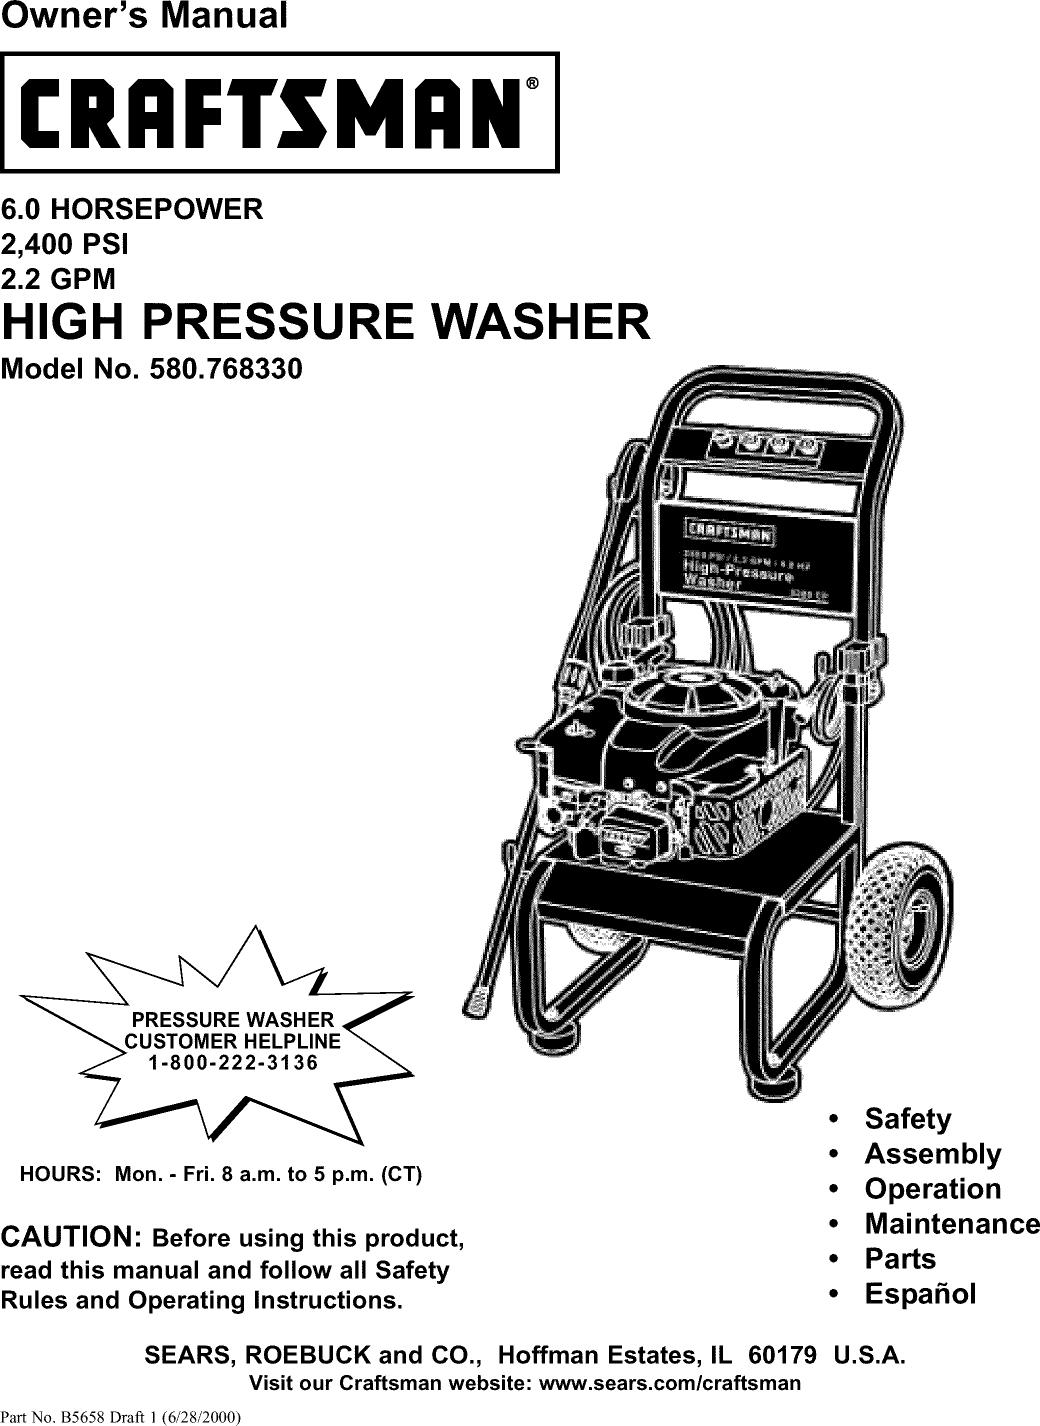 Craftsman 580768330 User Manual PRESSURE WASHER Manuals